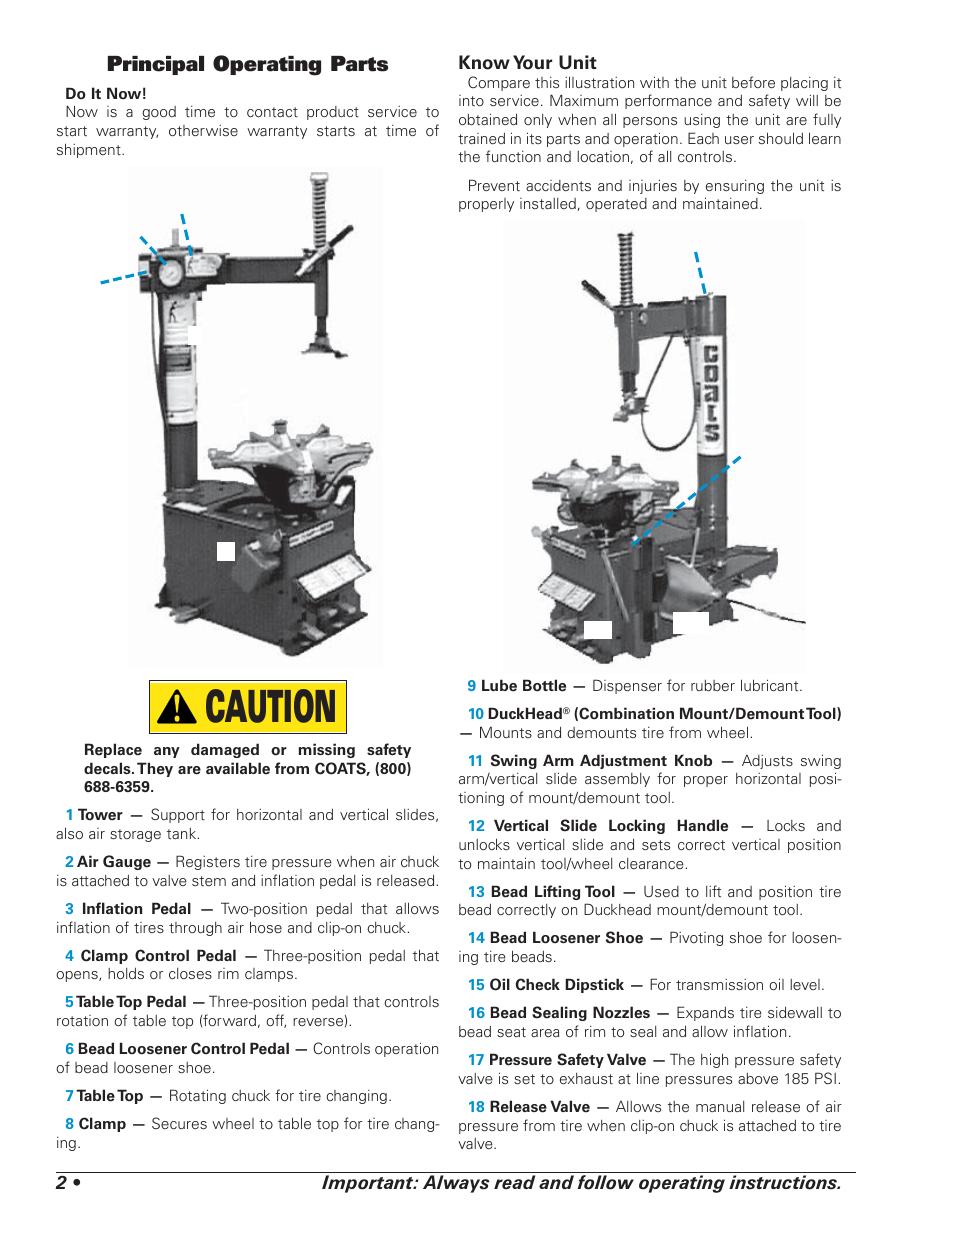 caution principal operating parts coats 5030 a e tire changer rh manualsdir com Atlas Tire Changer Manual manual tire changer instruction manuals ch22